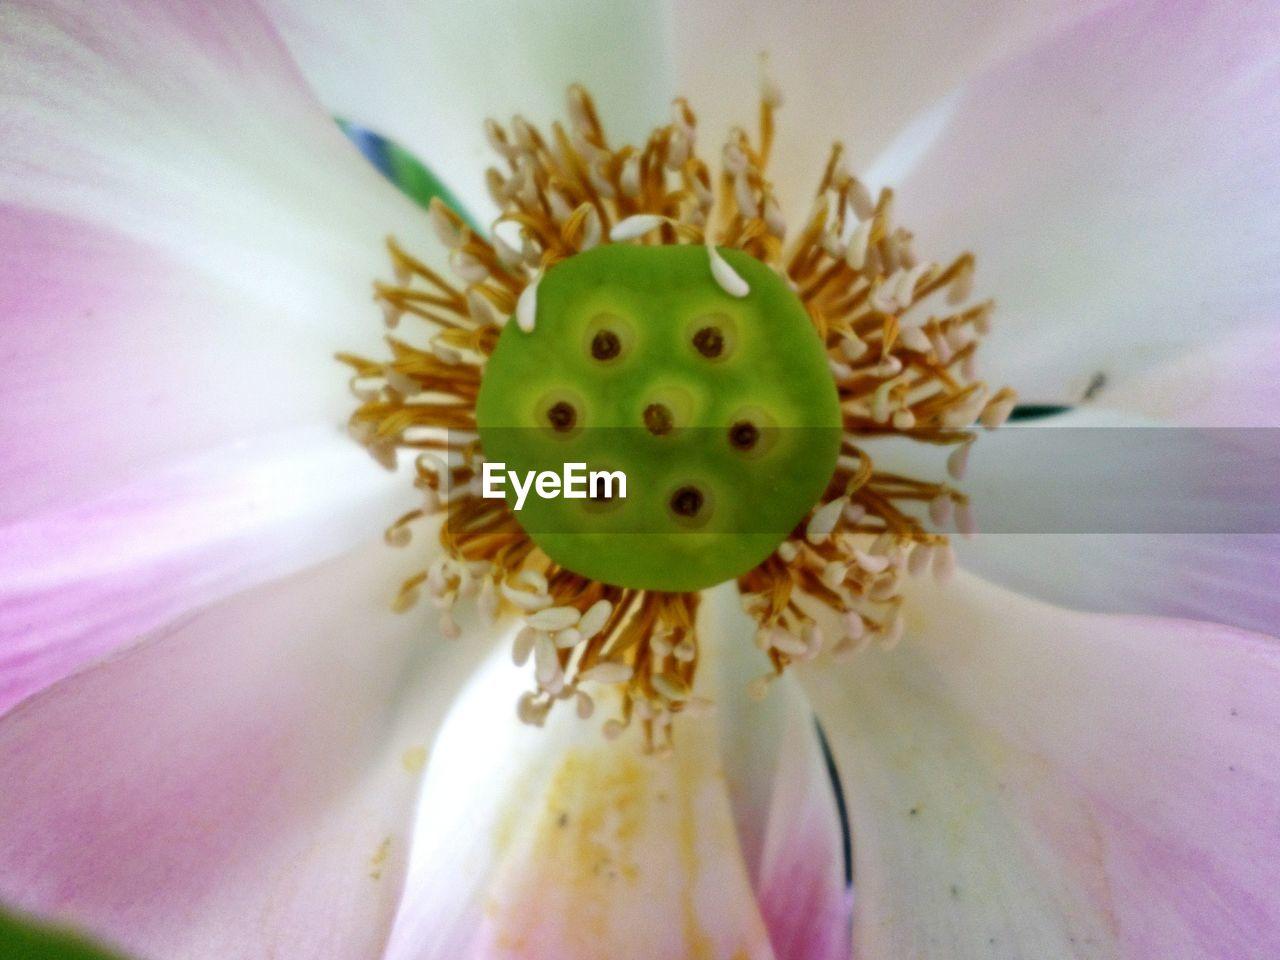 MACRO SHOT OF FRESH PINK FLOWER WITH PURPLE POLLEN